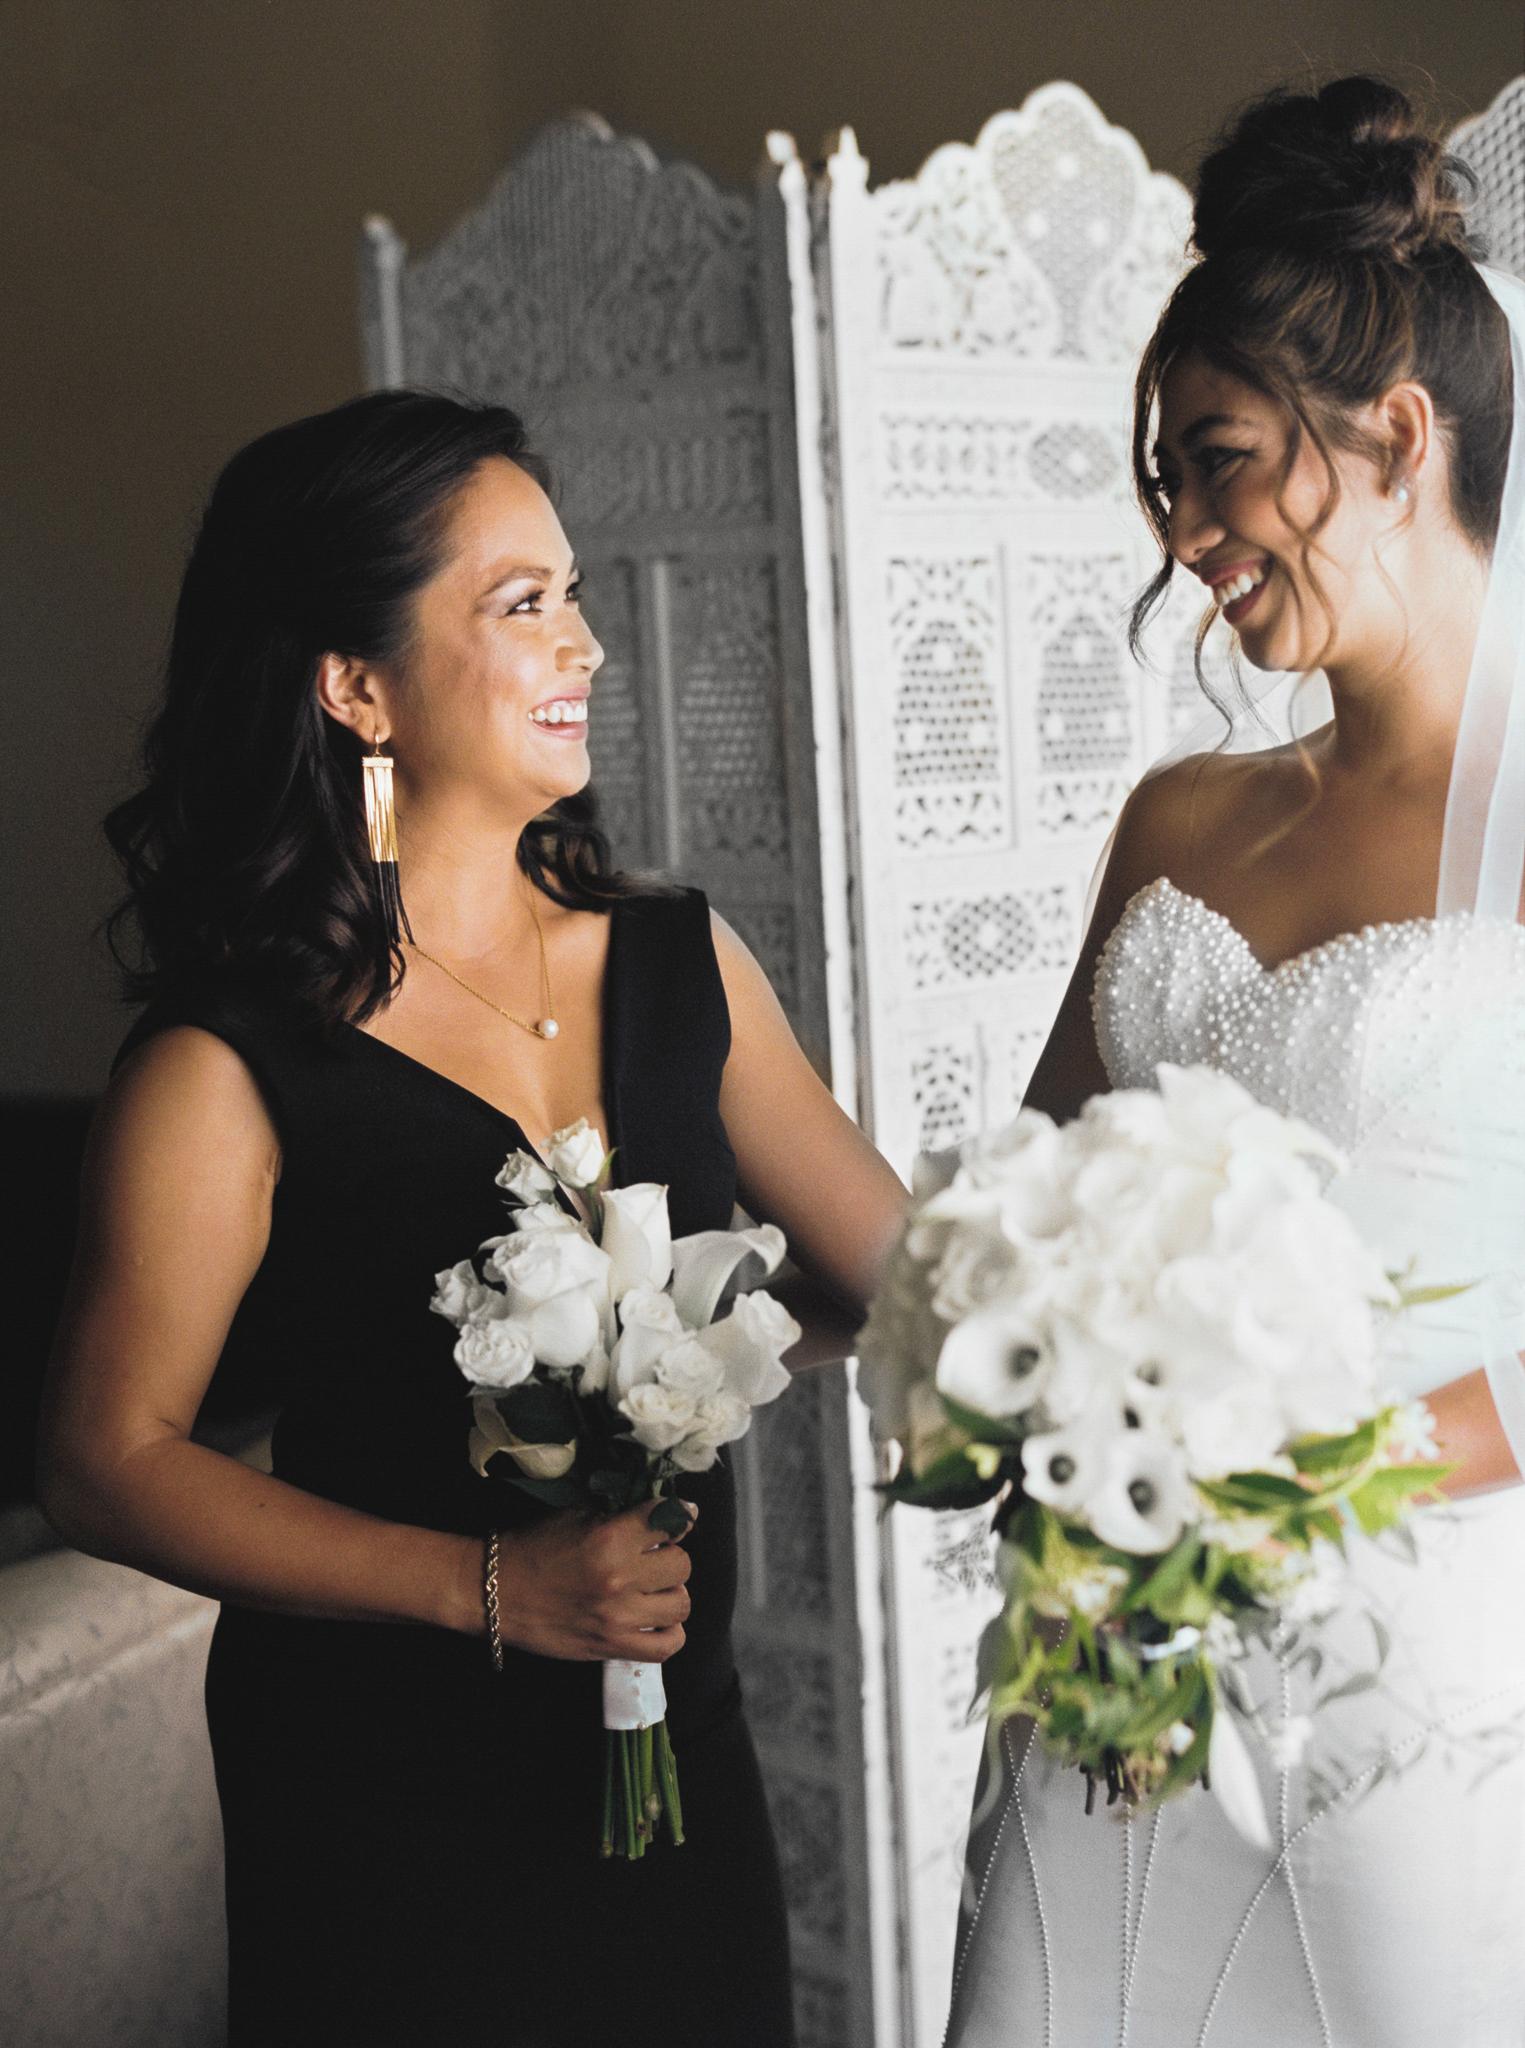 025OutliveCreative_Travel_Photographer_Videographer_Lewis&Clark_Oregon_Elegant_BlackTie_Destination_Wedding.jpg